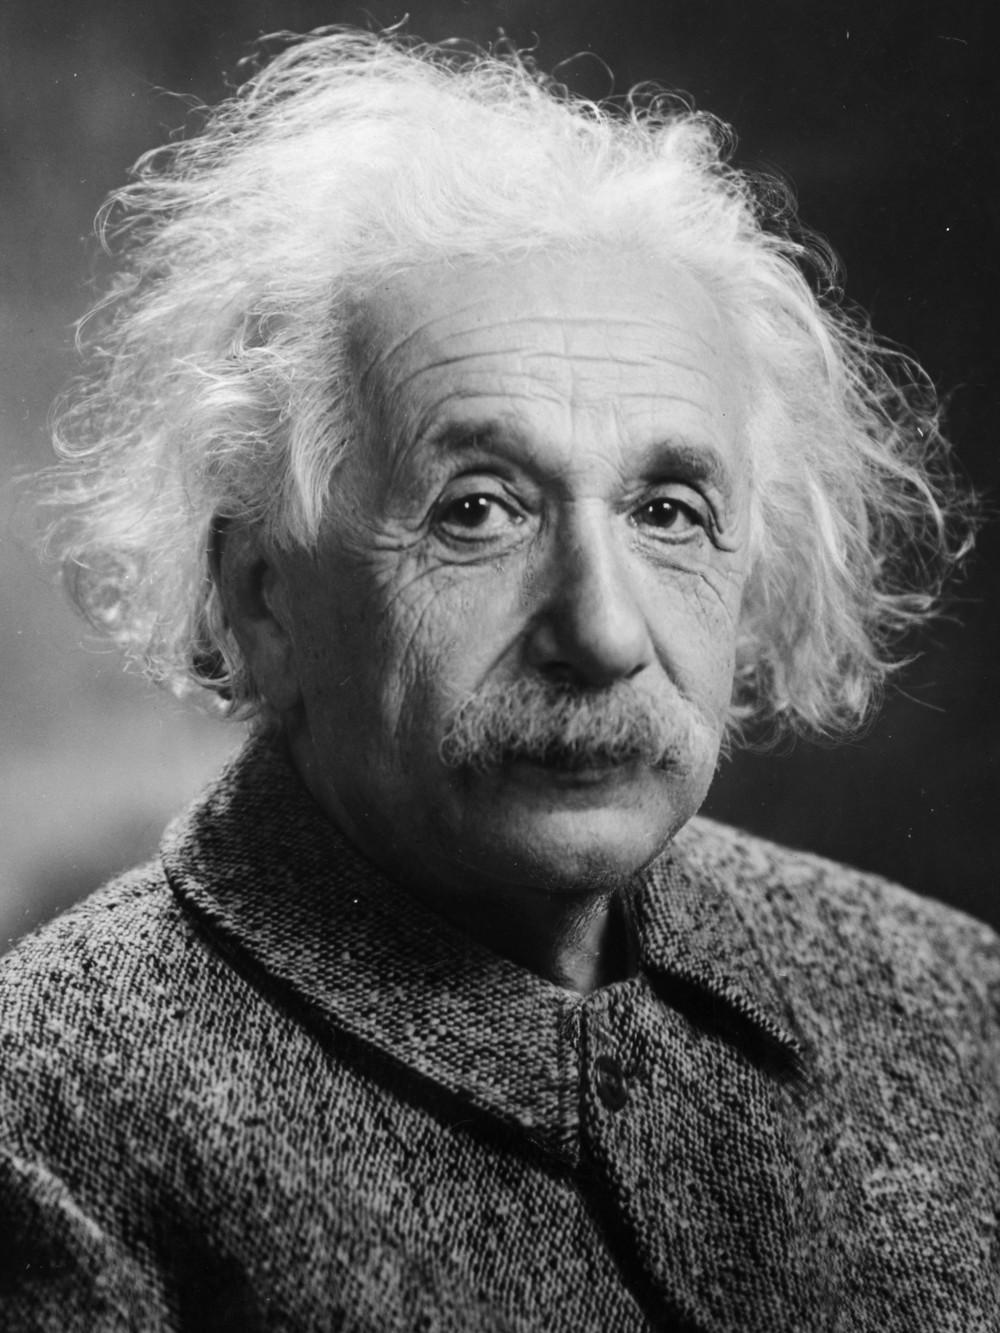 Albert Einstein. Credit: Orren Jack Turner via Wikimedia Commons